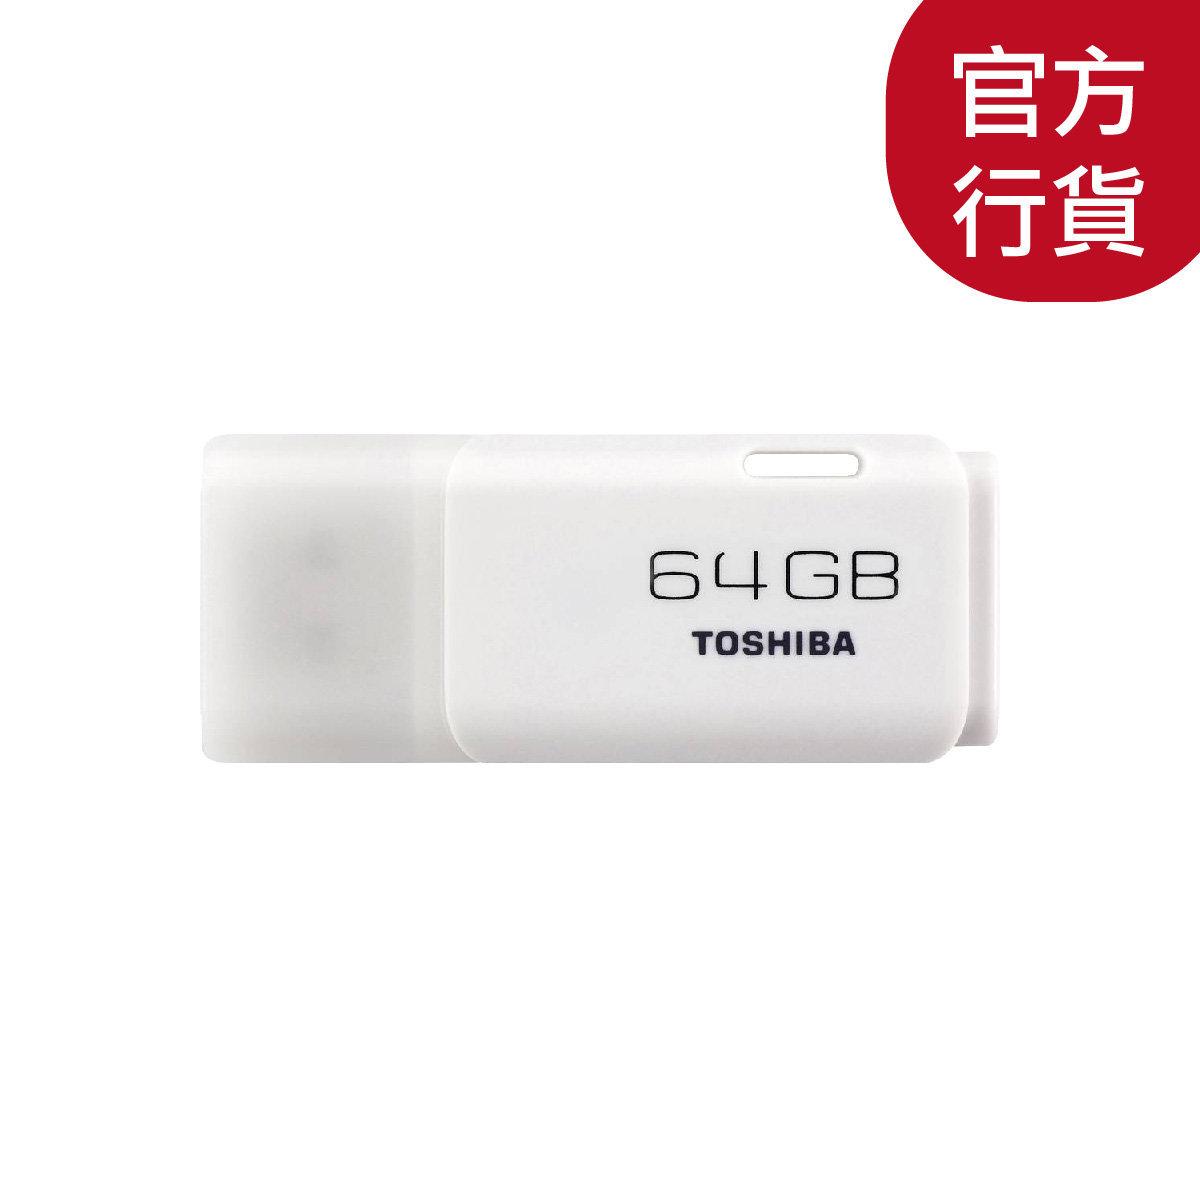 64GB TransMemory™ U202 USB2.0 Memory Stick White